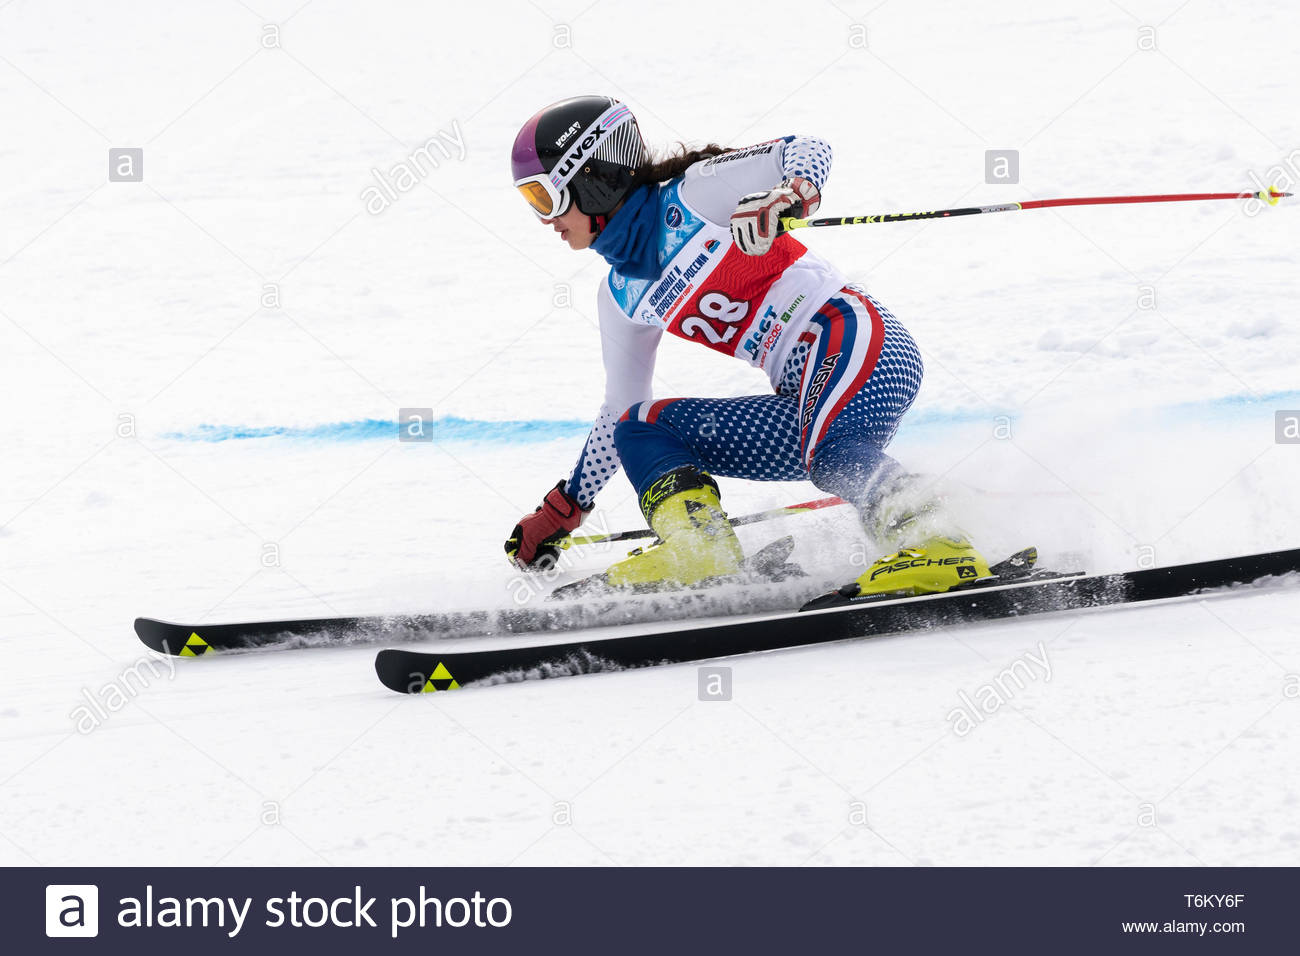 KAMCHATKA PENINSULA, RUSSIA - APR 2, 2019: Mountain skier Vakhnina Anna (Krasnoyarsk Region) skiing down mount. International Ski Federation Champions - Stock Image